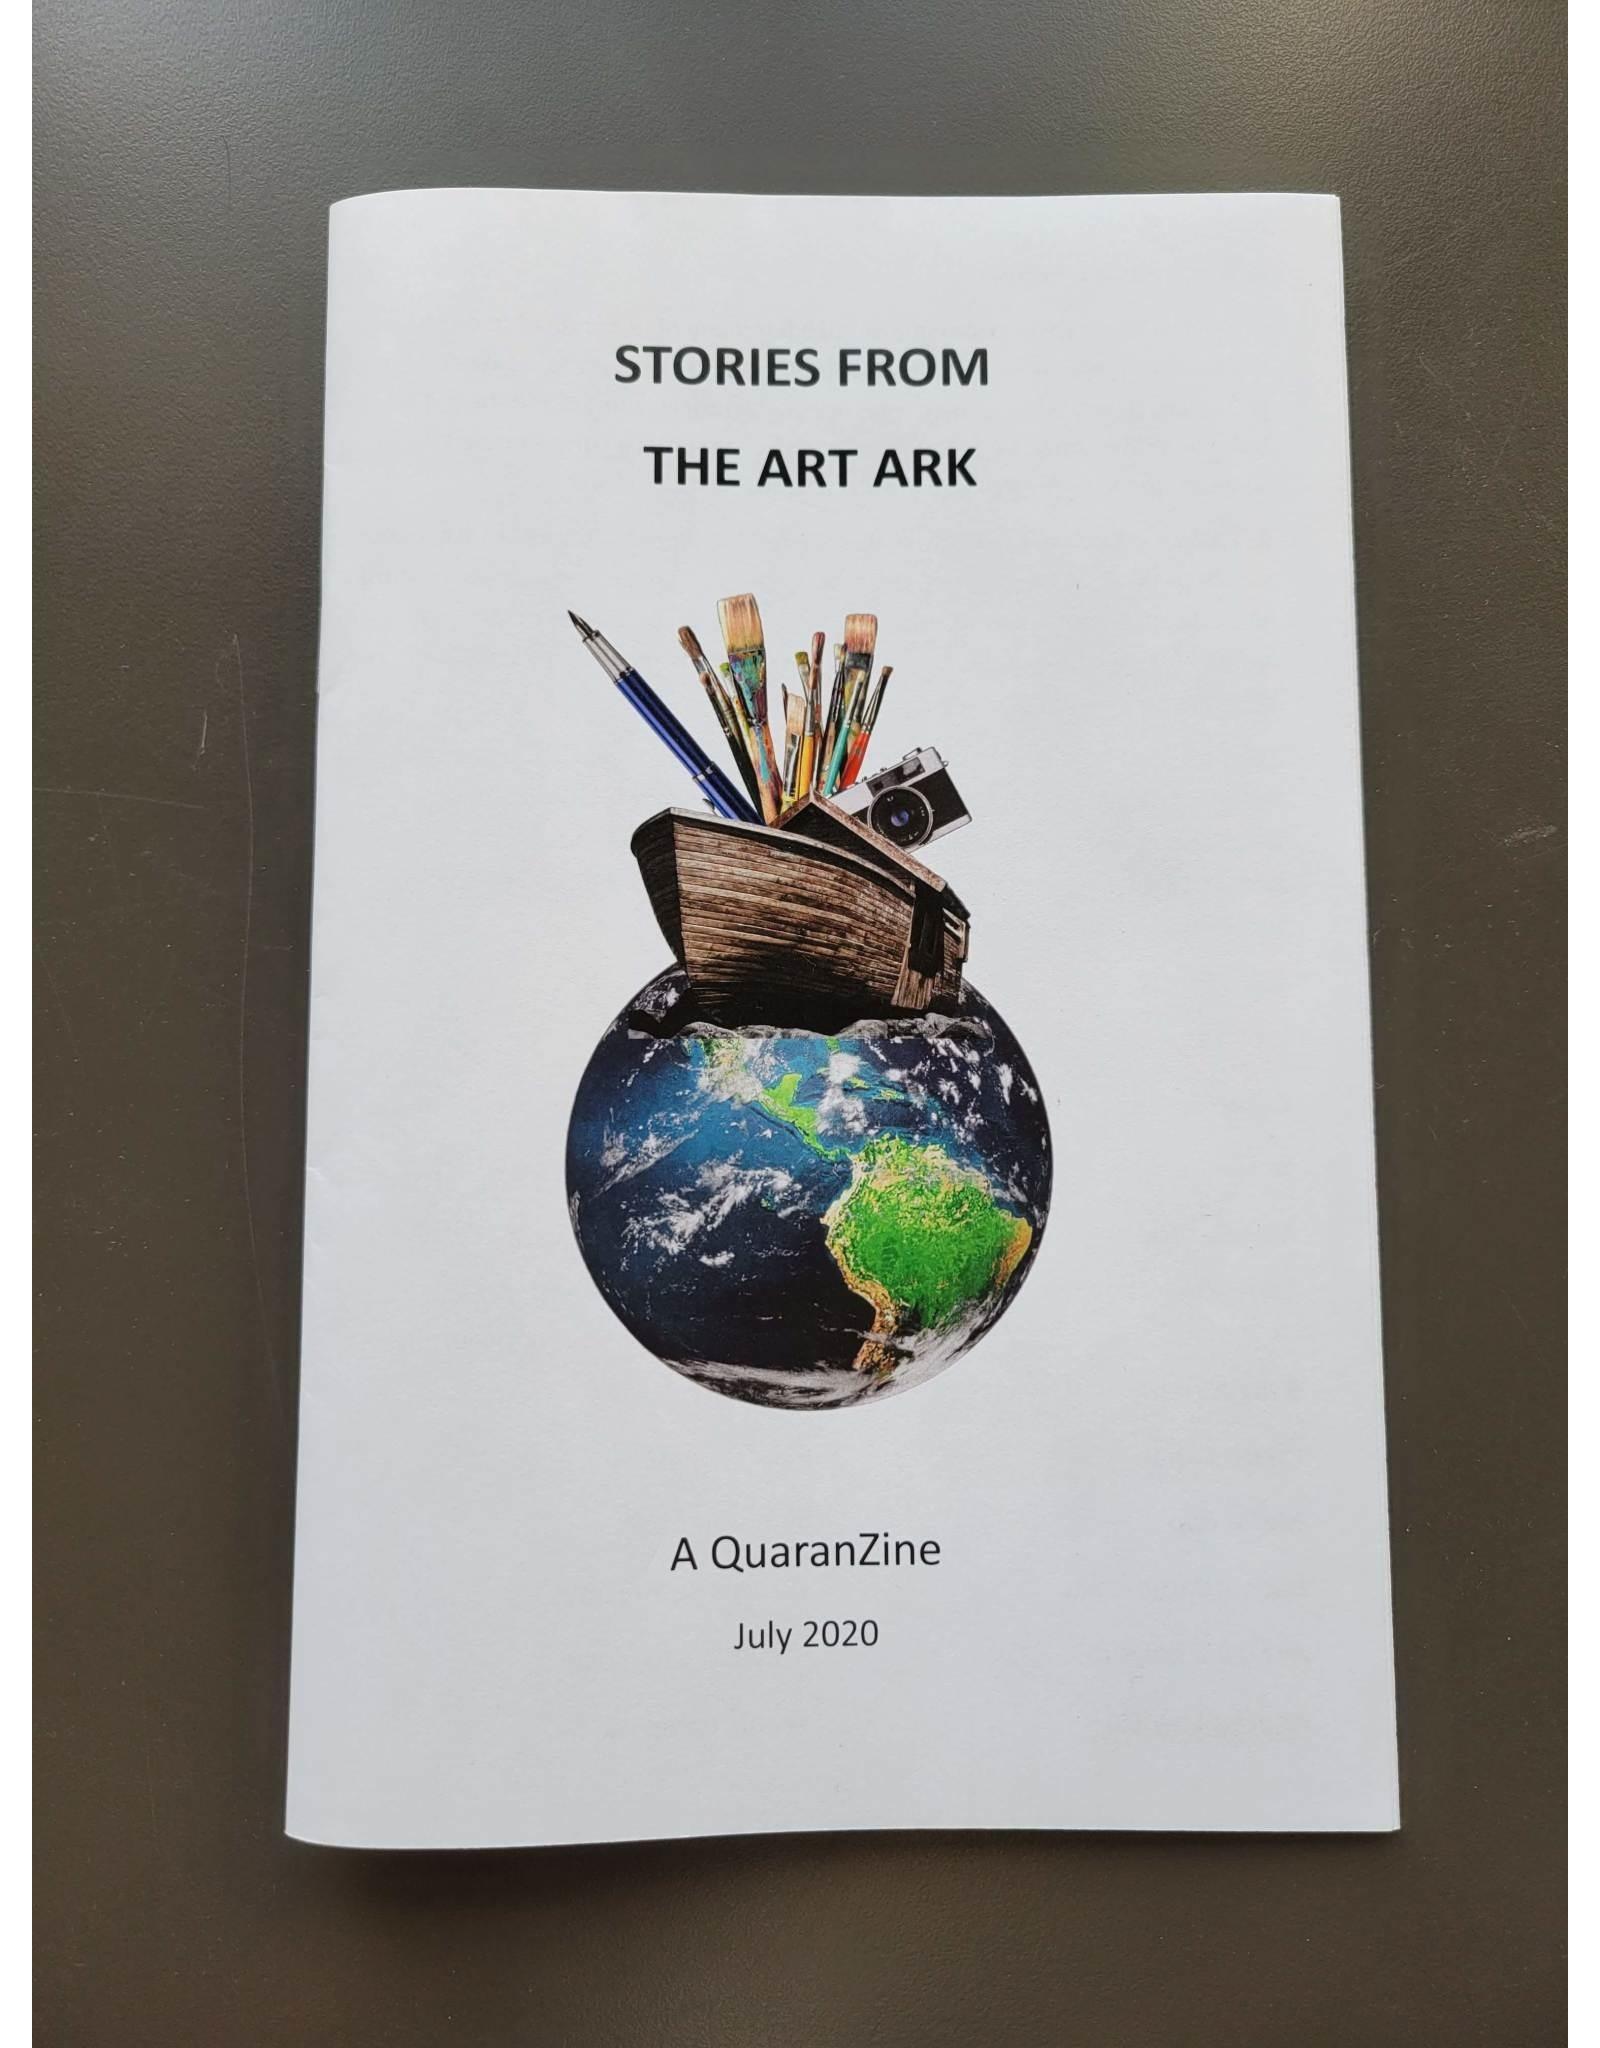 Epp, Maria Stories from the Art Ark: A QuaranZine